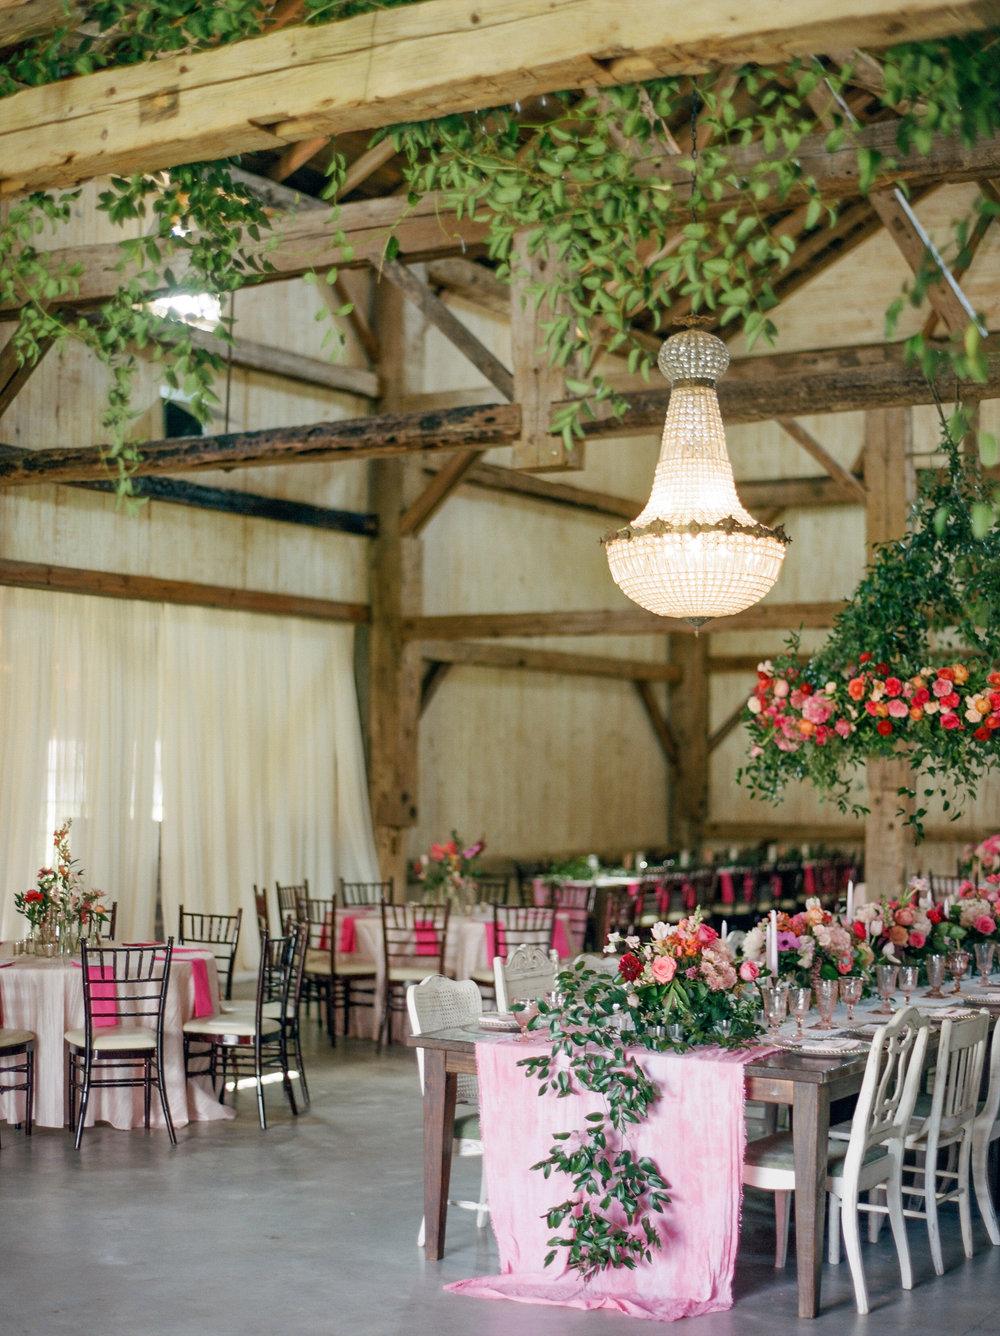 The-Knot-50-Weddings-50-States-Texas-Winner-Dana-Fernandez-photography-houston-wedding-photographer-film-fine-art-destination-35.jpg